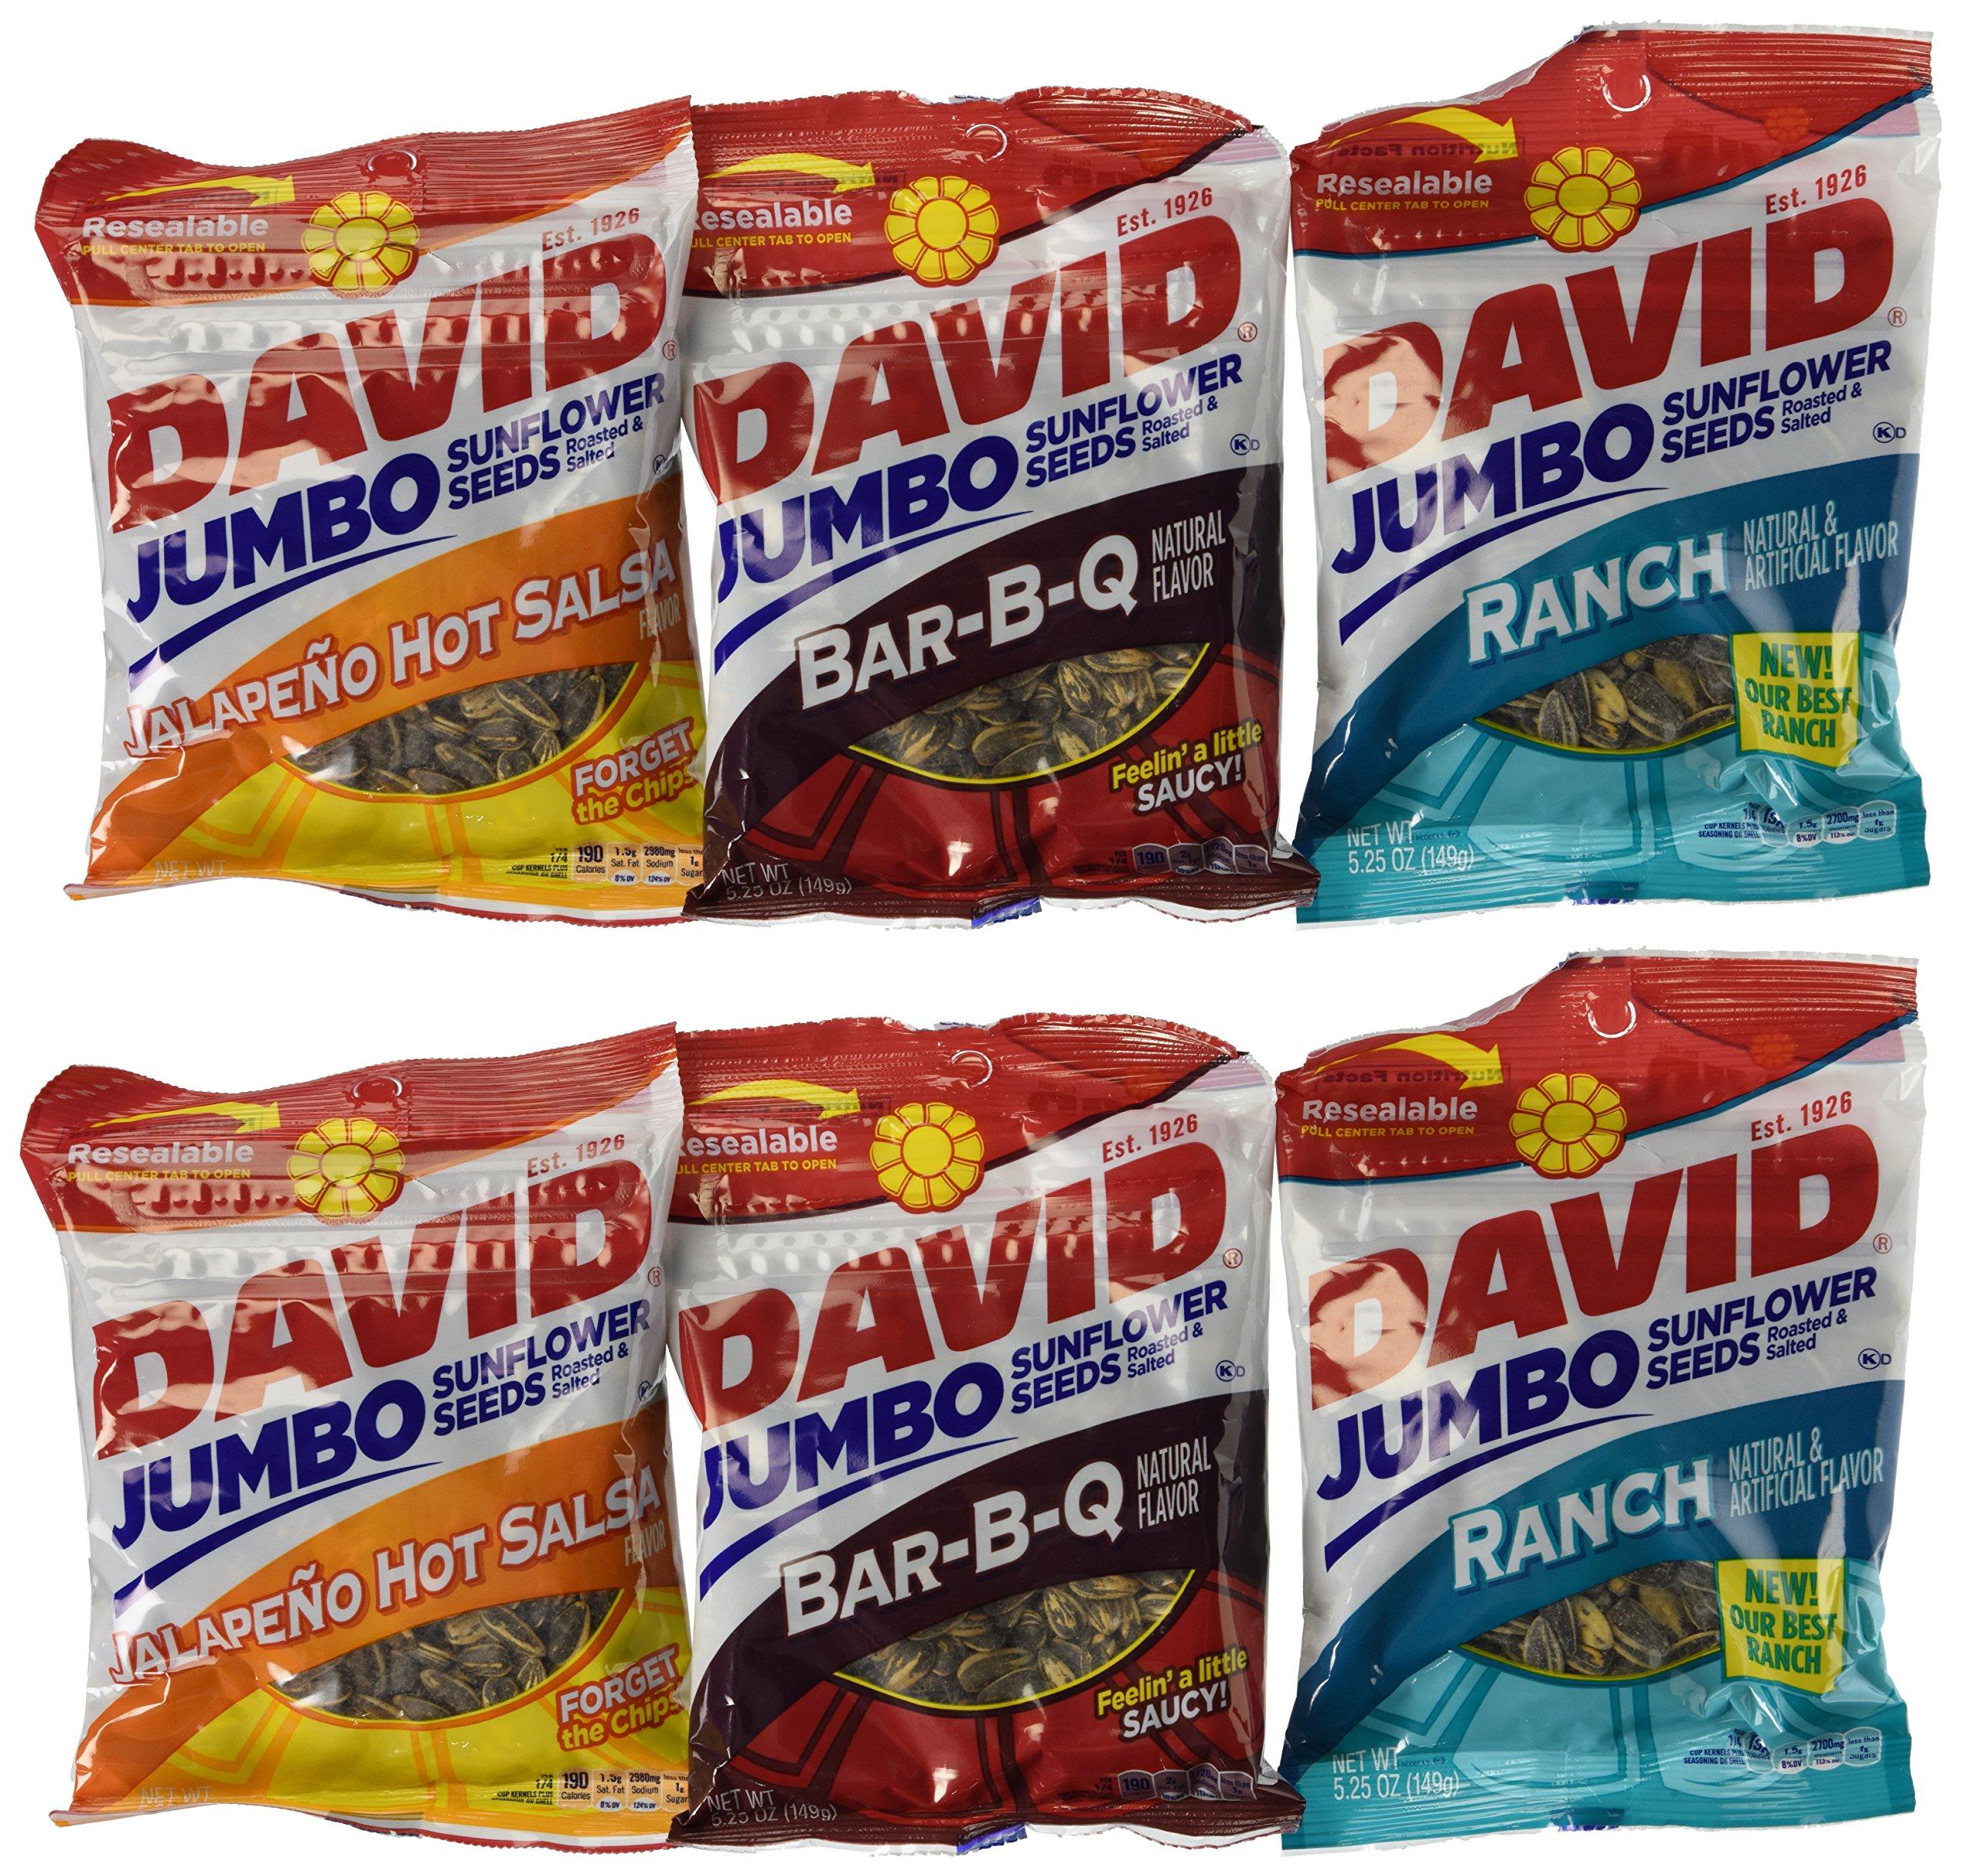 David Jumbo Sunflower Seeds, 5.25 oz Packages, Variety Bundle (Pack of 6)